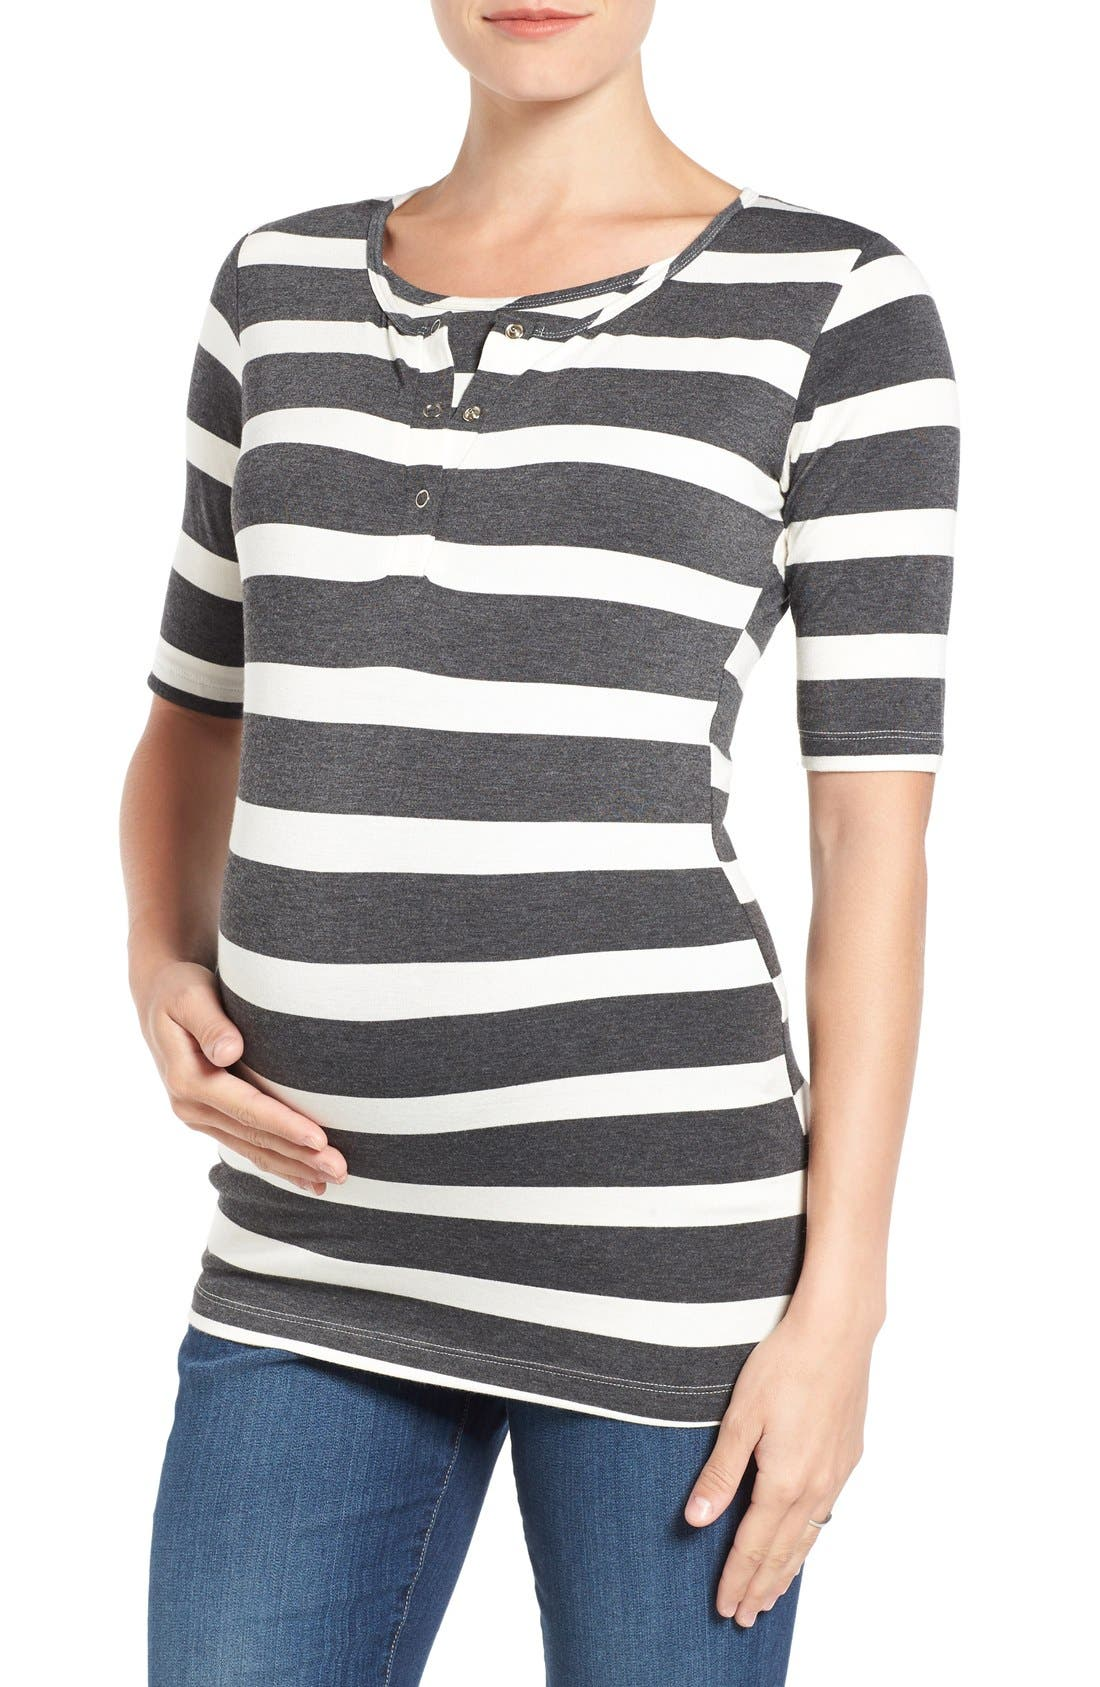 'Joey' Maternity/Nursing Top,                         Main,                         color, Charcoal/ Cream Stripe